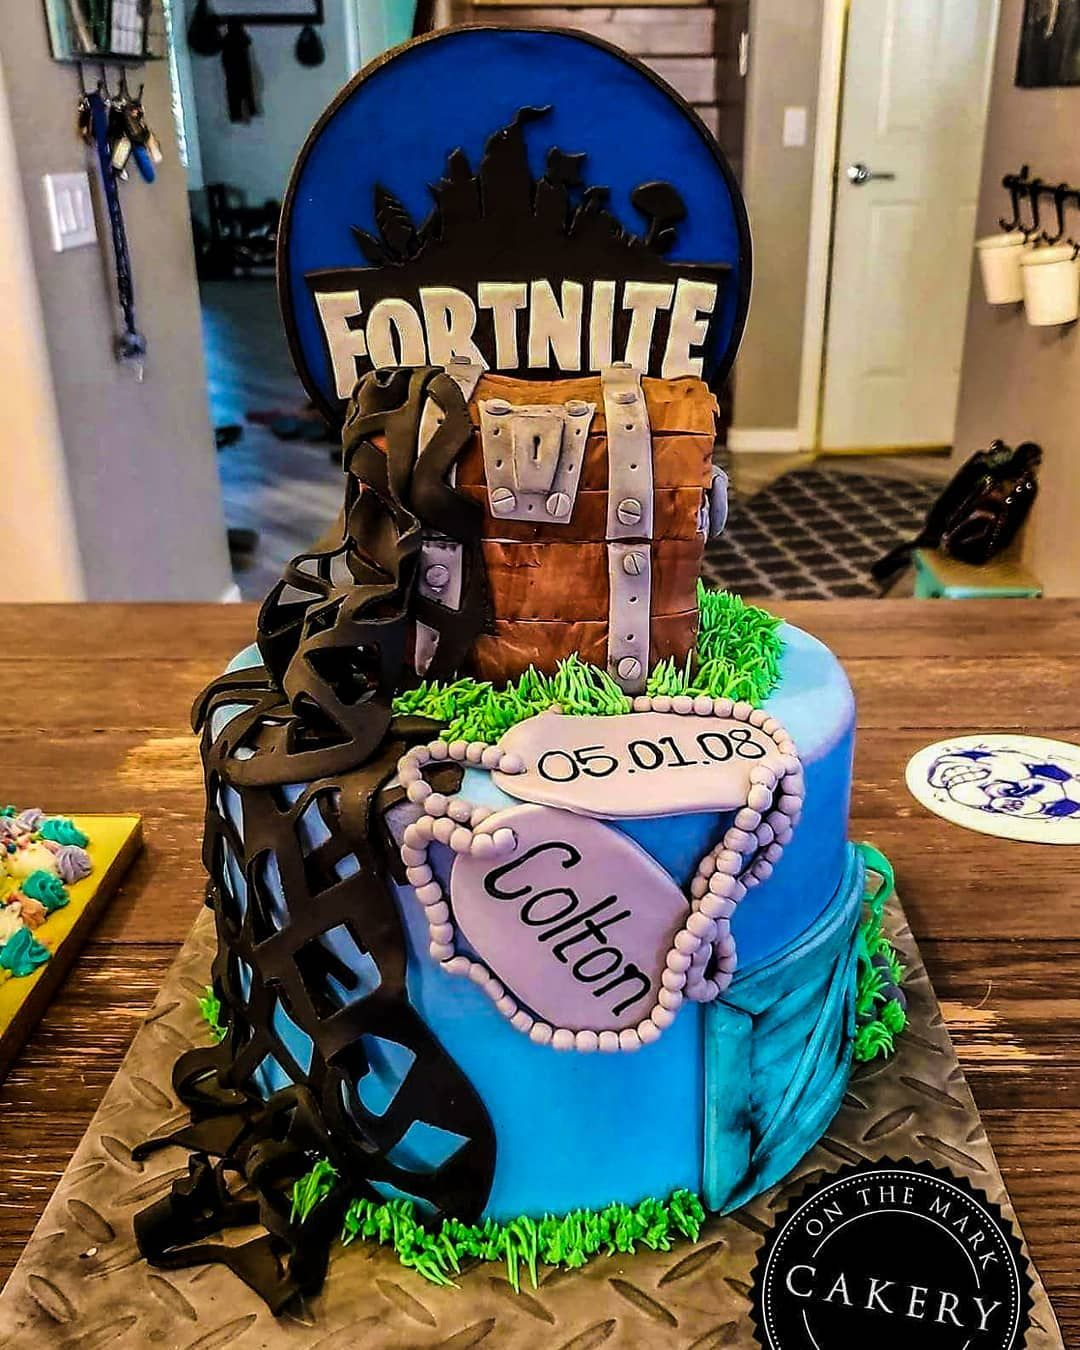 Fortnite Inspired Birthday Cake Perfect For Your Gamer